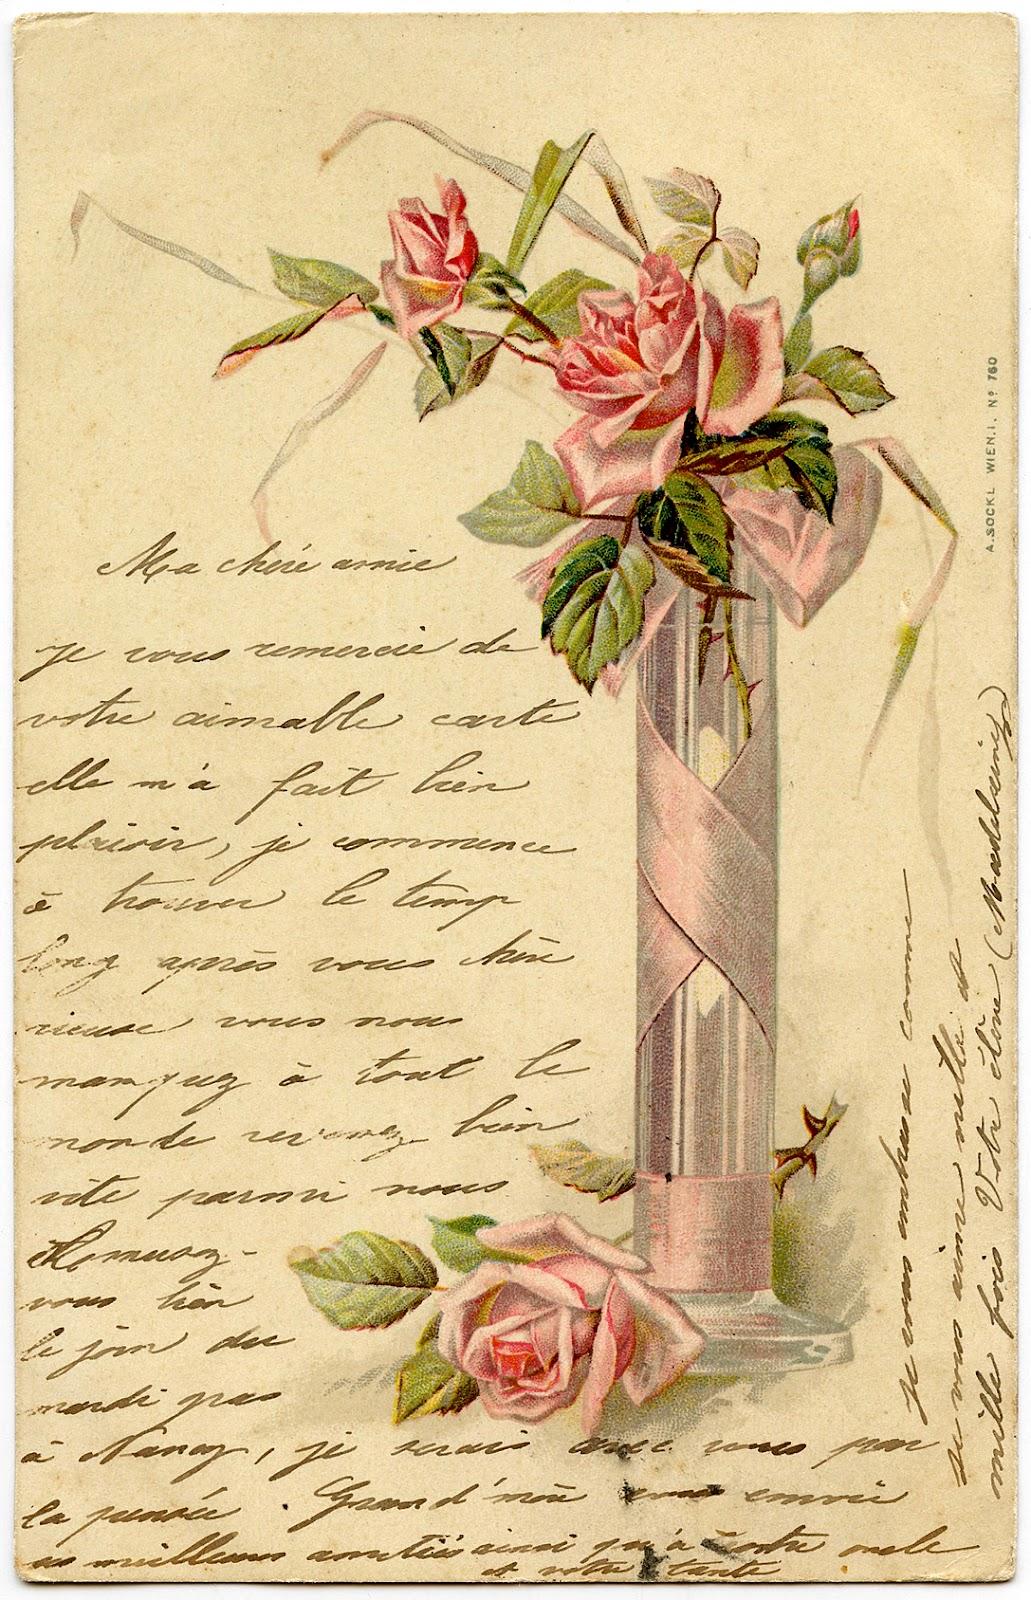 Romantic French Image